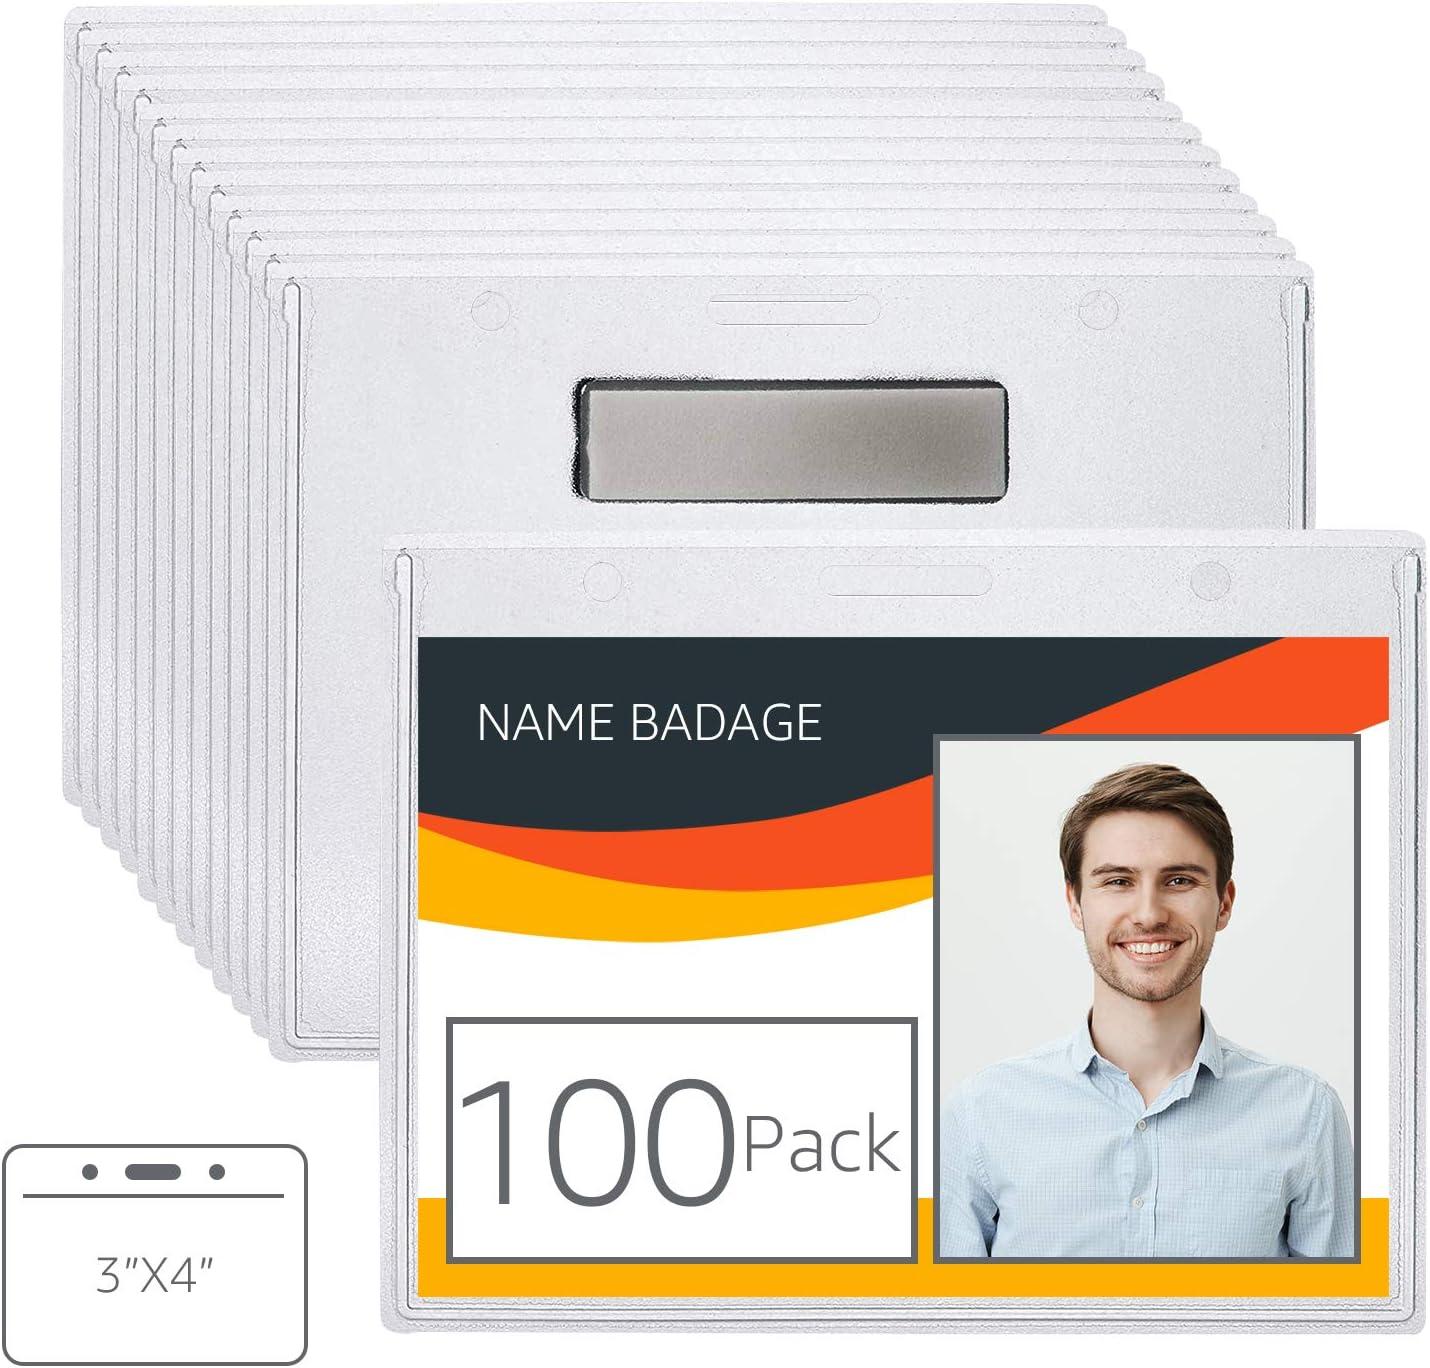 AmazonBasics Horizontal Magnetic Badge Holder - Pack of 100, Clear